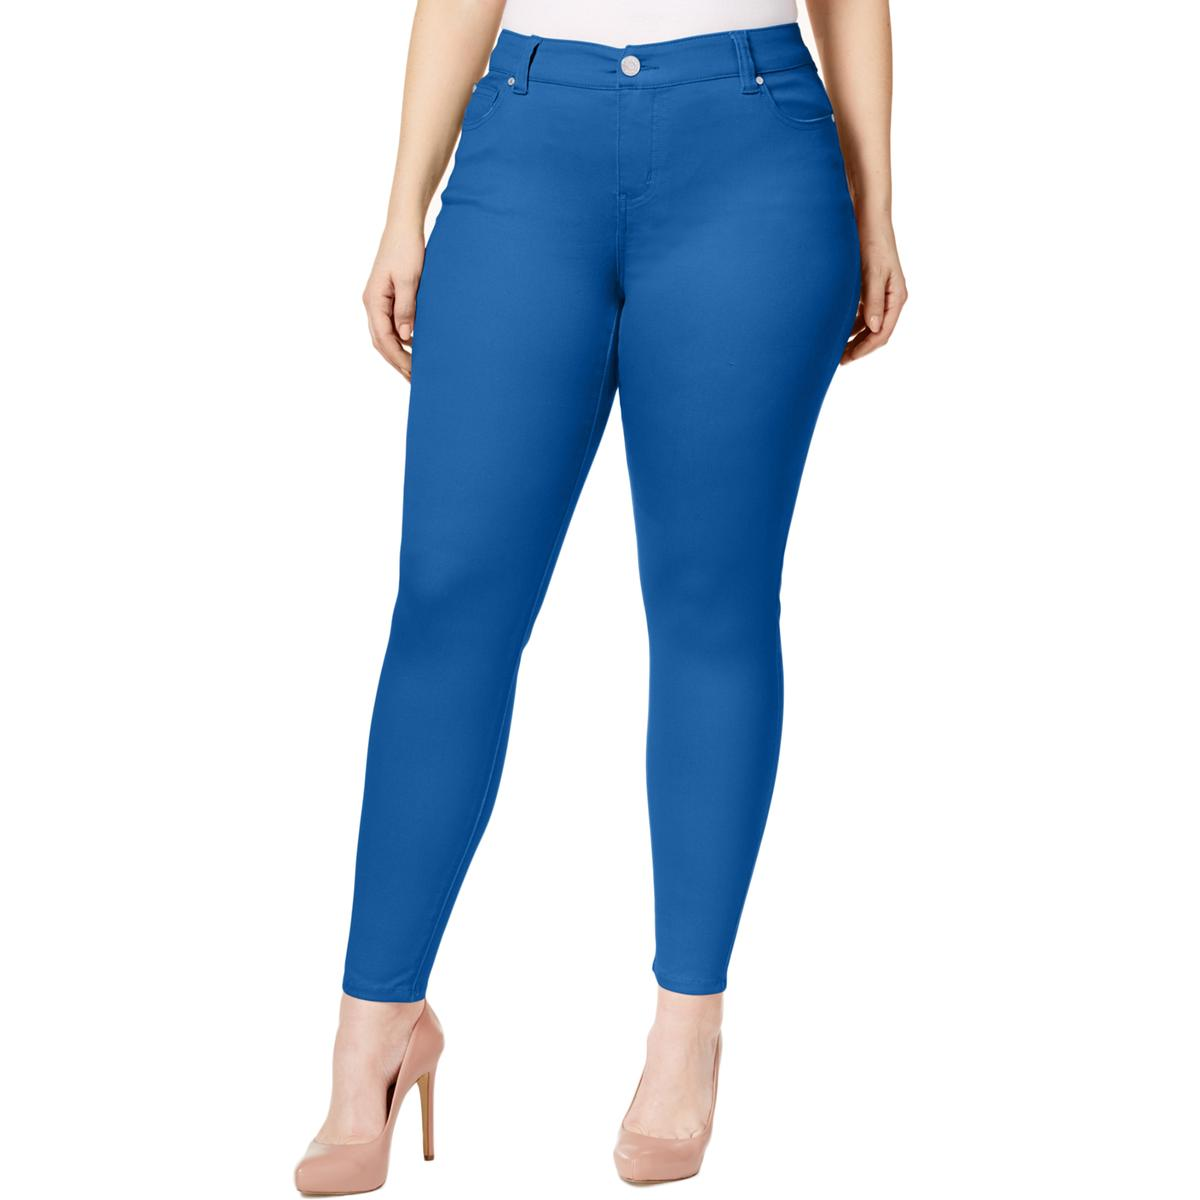 d198cc737d4 Details about Celebrity Pink Womens Blue Denim Colored Mid-Rise Skinny Jeans  16 BHFO 1977